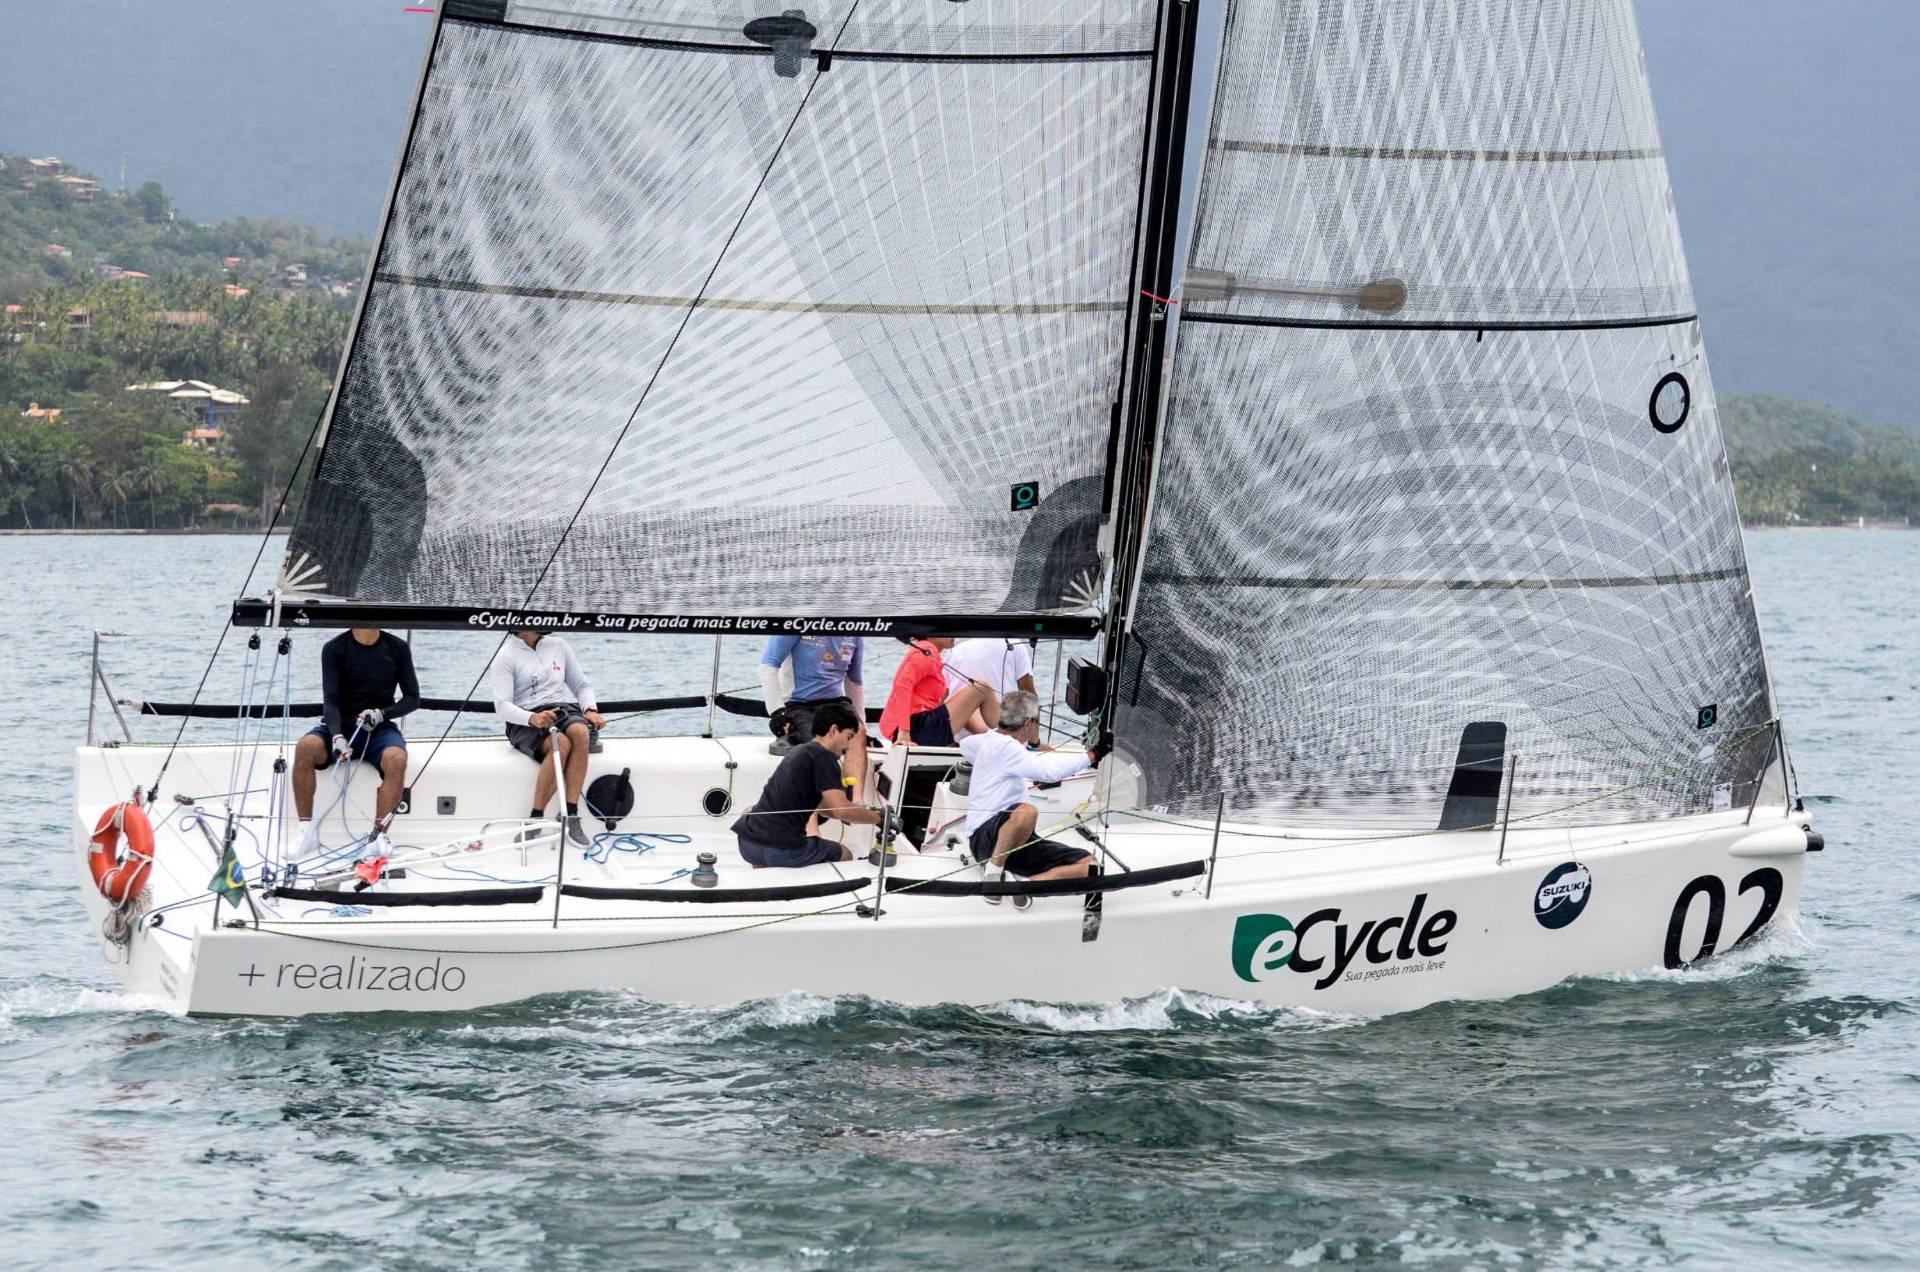 eCycle +Realizado (Aline Bassi Balaio de Ideias) - boat shopping